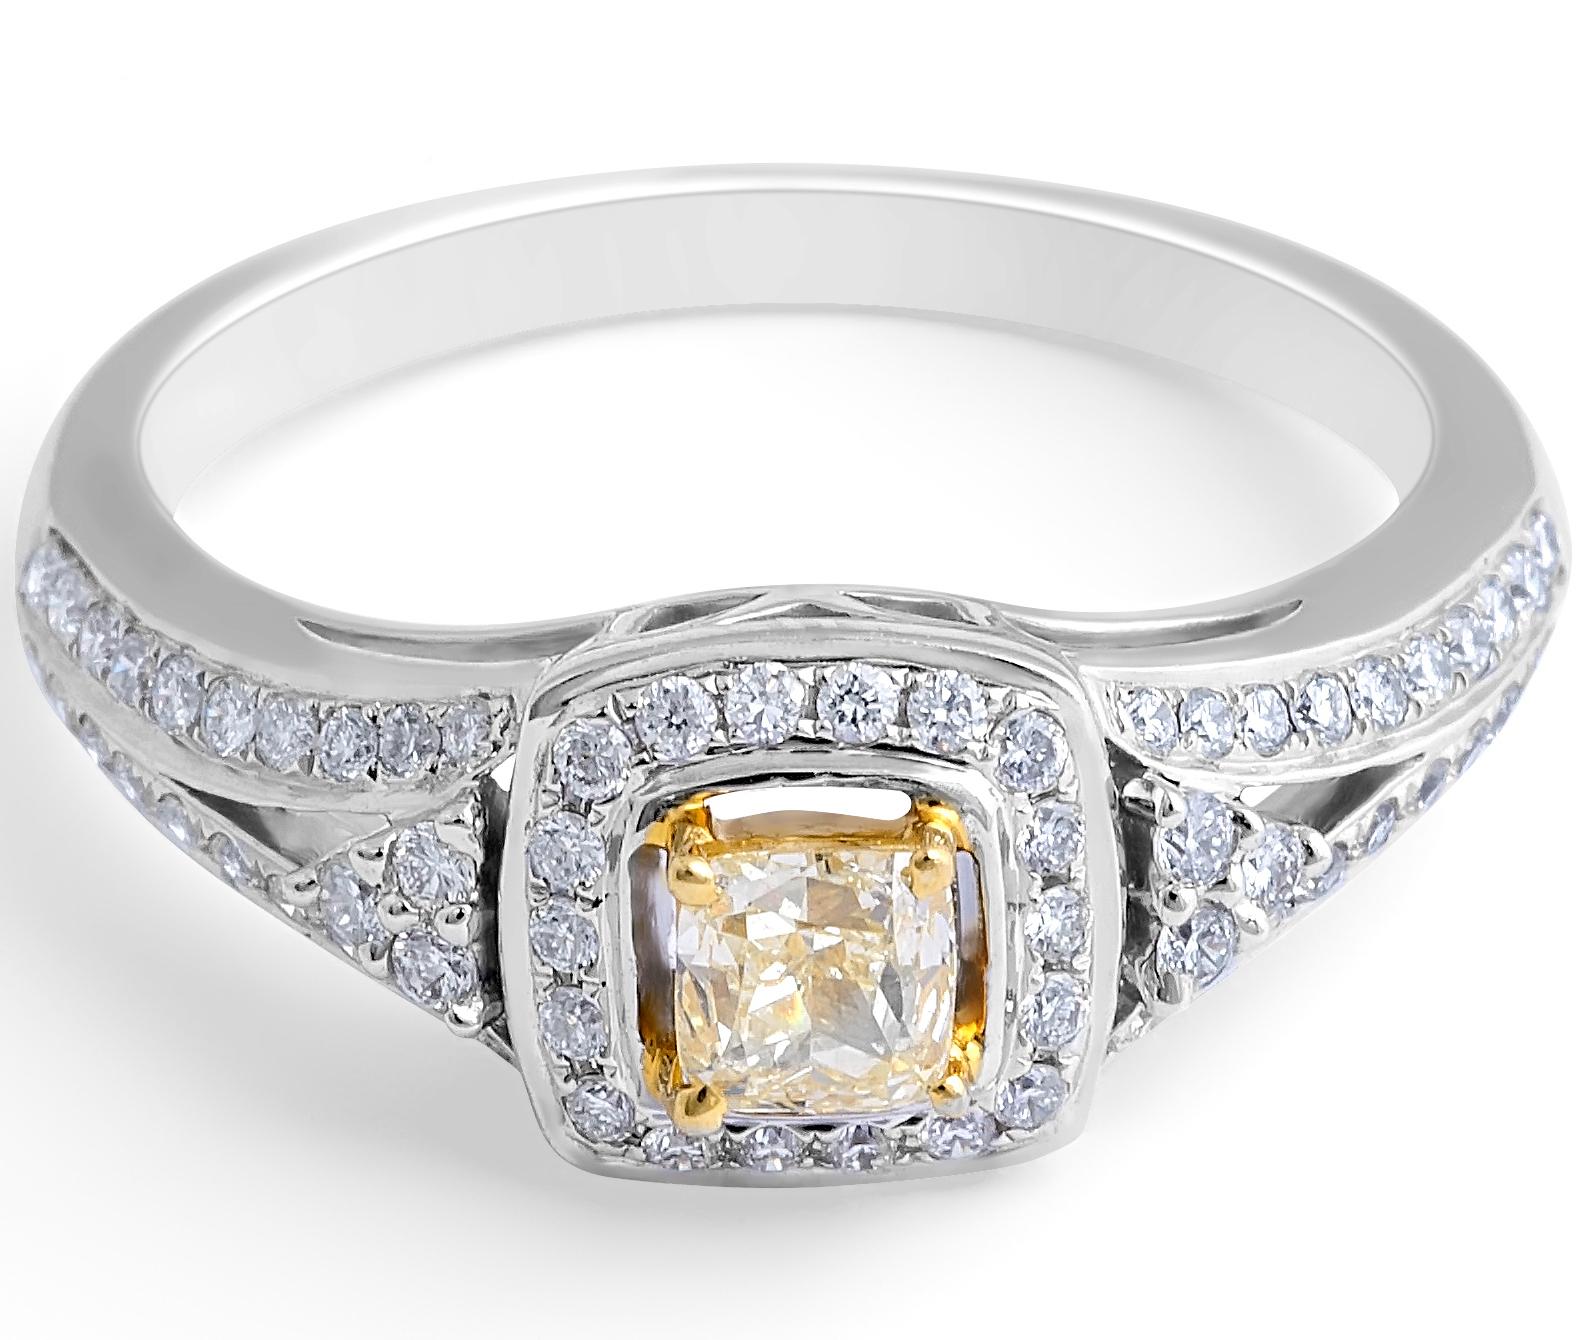 Fancy Yellow Cushion Diamond Halo Ring in 18 Karat Gemstone rings